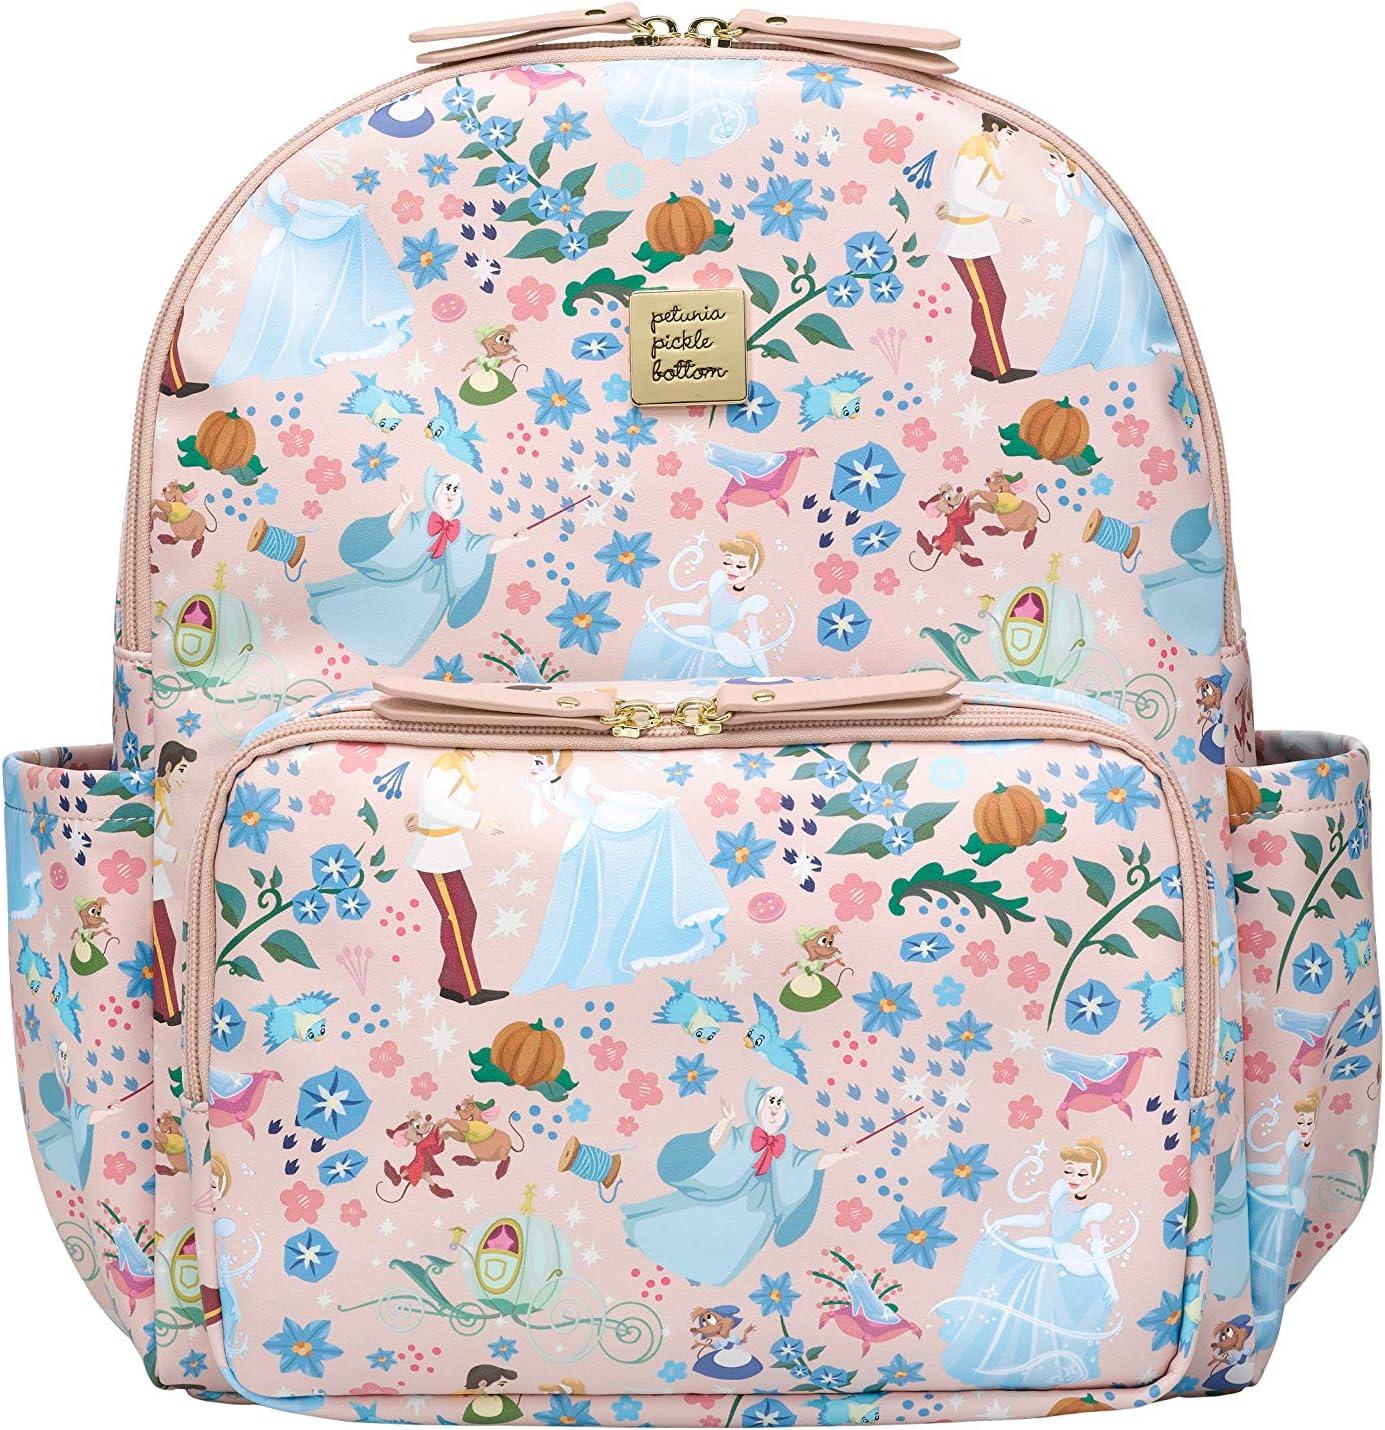 Petunia Pickle Bottom – District Backpack - Cinderella Disney Collaboration